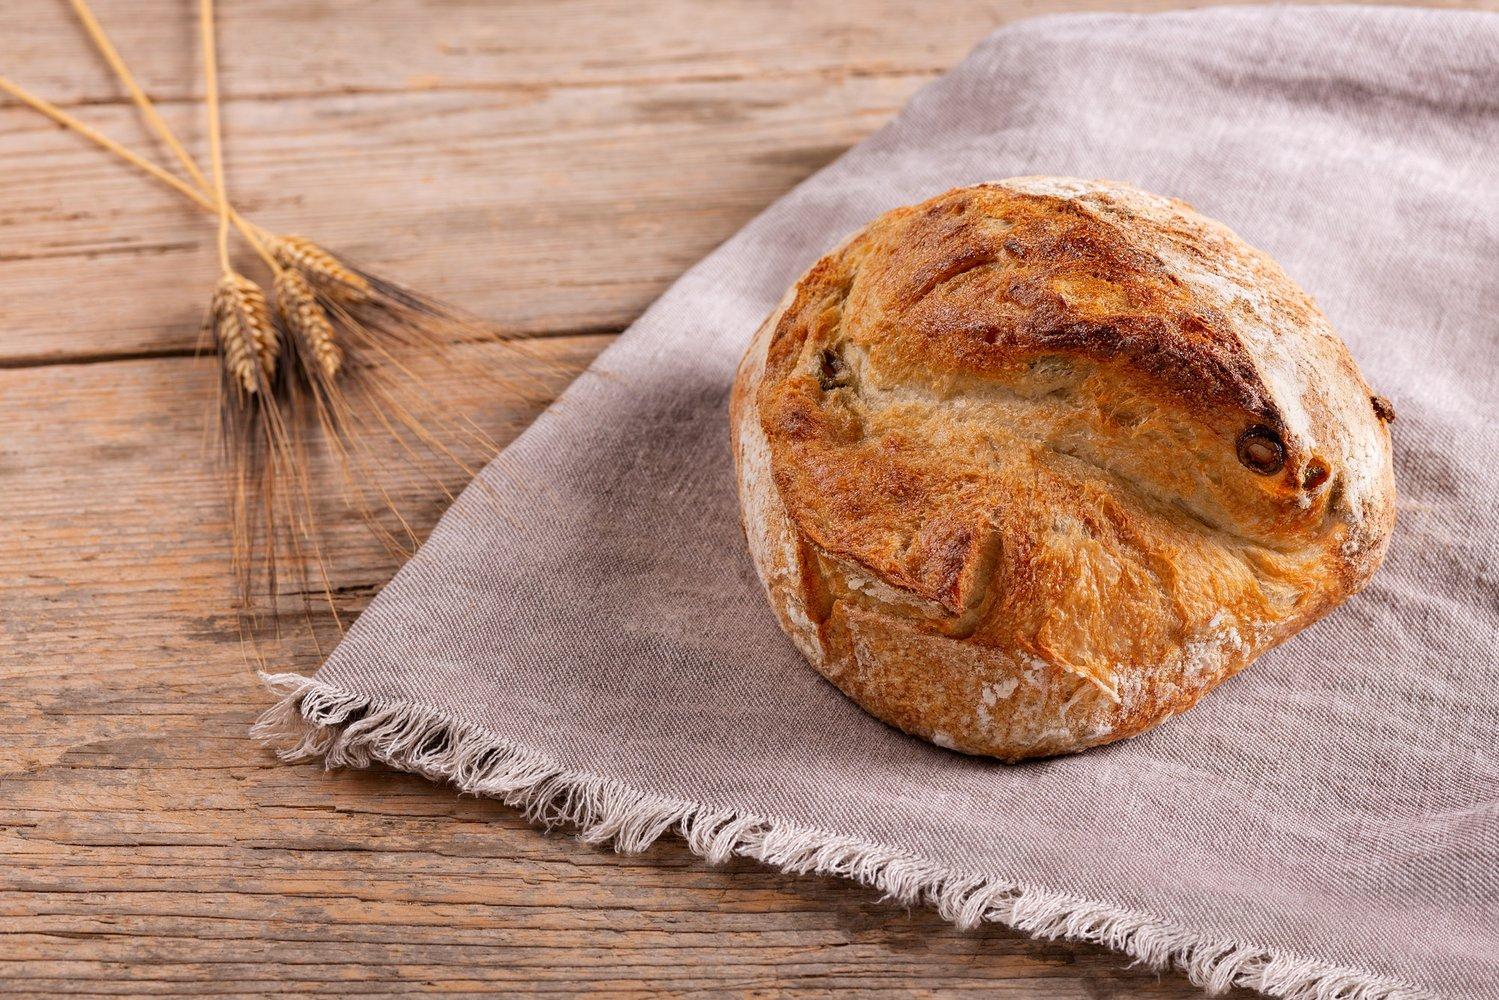 Foodfotografie - Brot, Gebäck